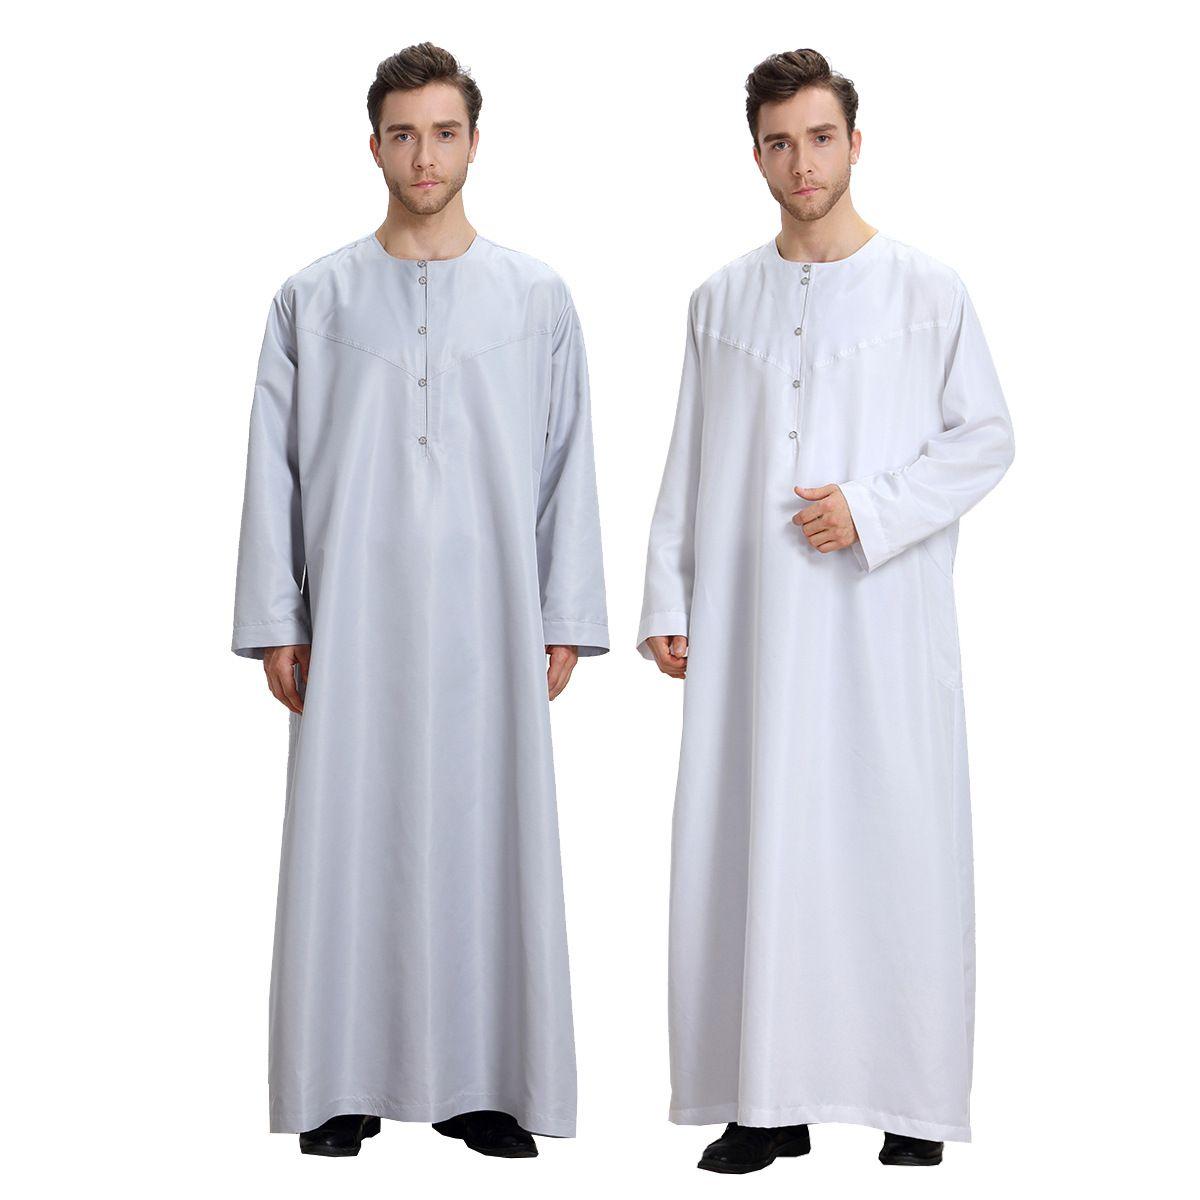 Muslimische Kleidung Kaftan Dubai Musulman Long Sleeves Weiß Thobes Islamic Homme Kleidung Sommer Islamische Kleidung Männer Roben DK755MZ